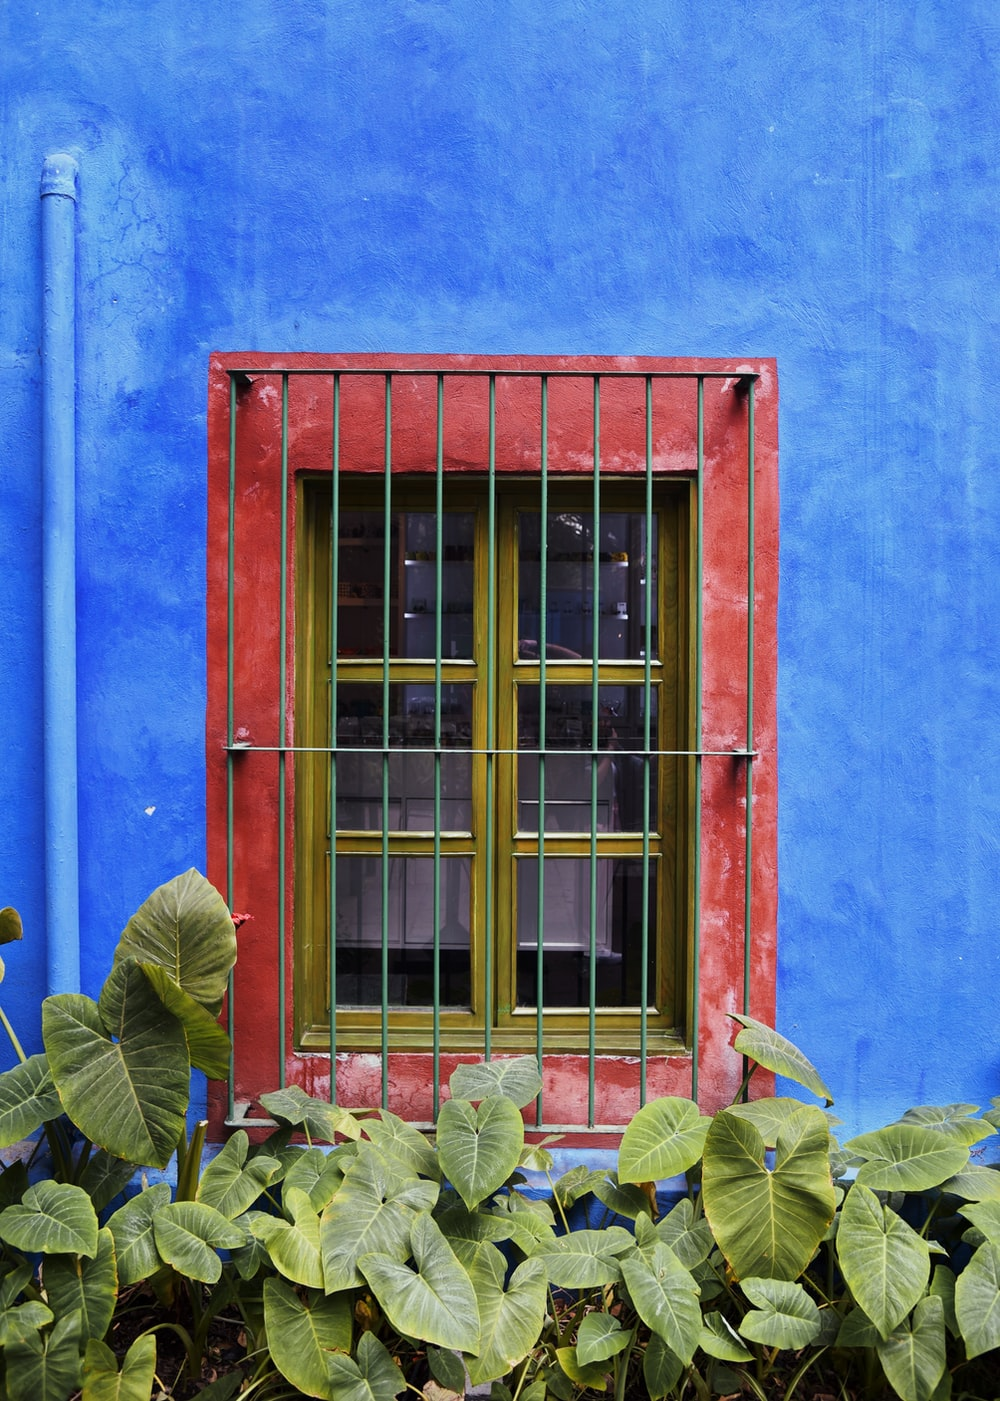 closed yellow window